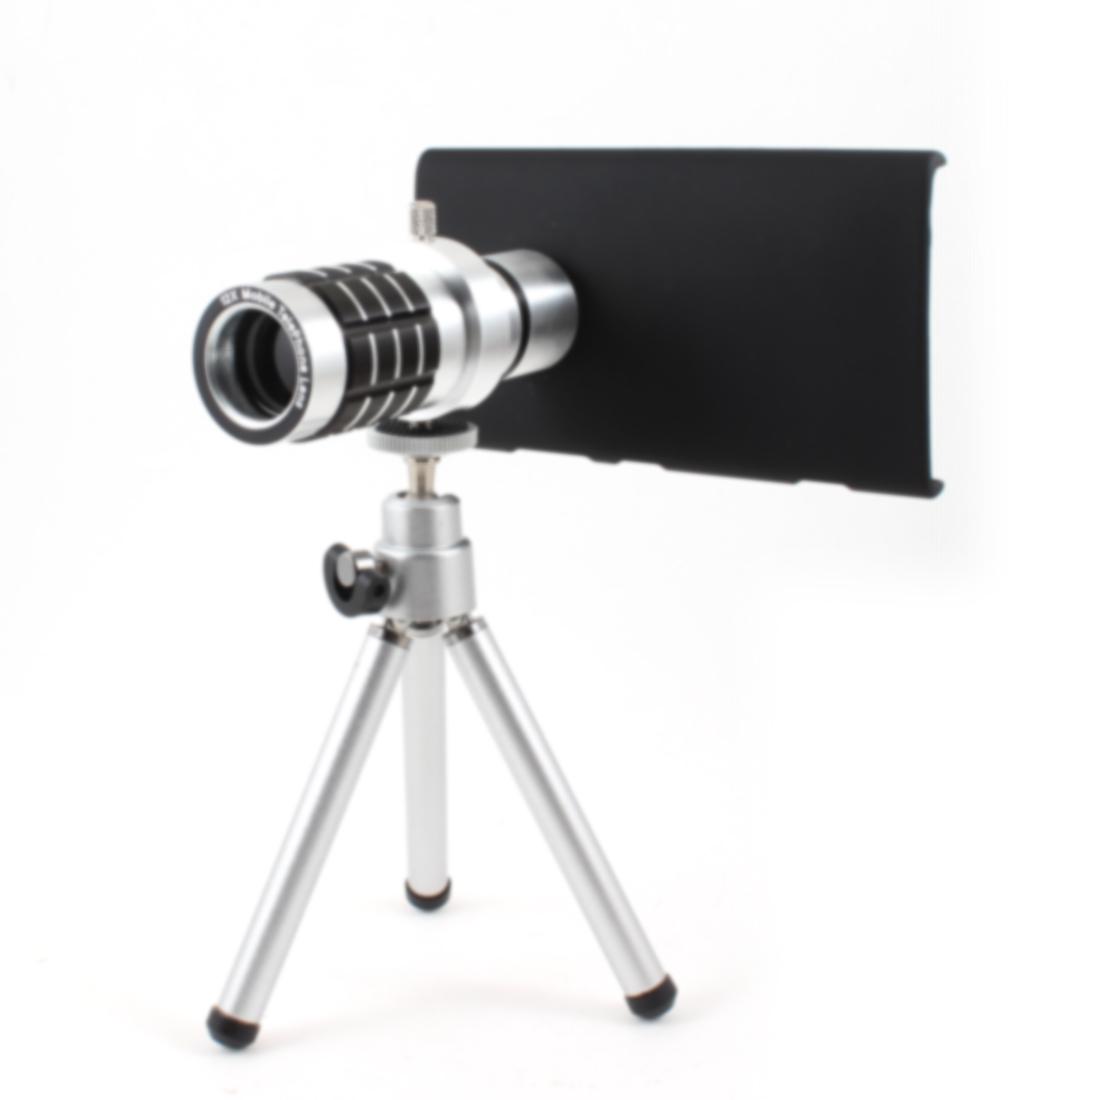 12X Zoom Lens Camera Telescope + Telescopic Tripod + Case Nokia Lumia 920